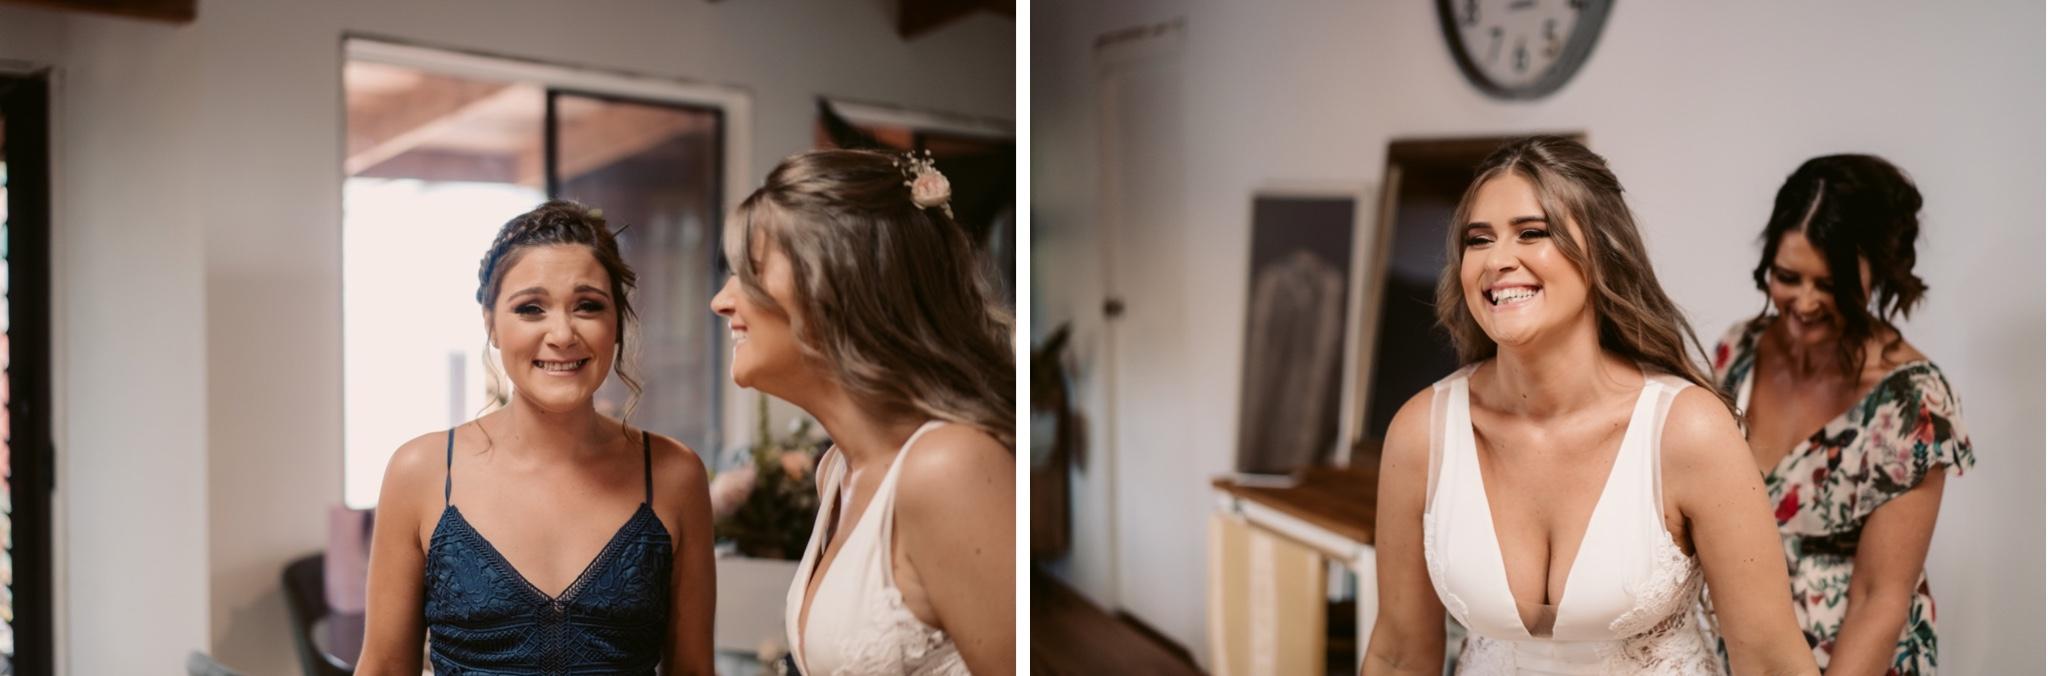 Mornington Peninsula Wedding Photography18.jpg